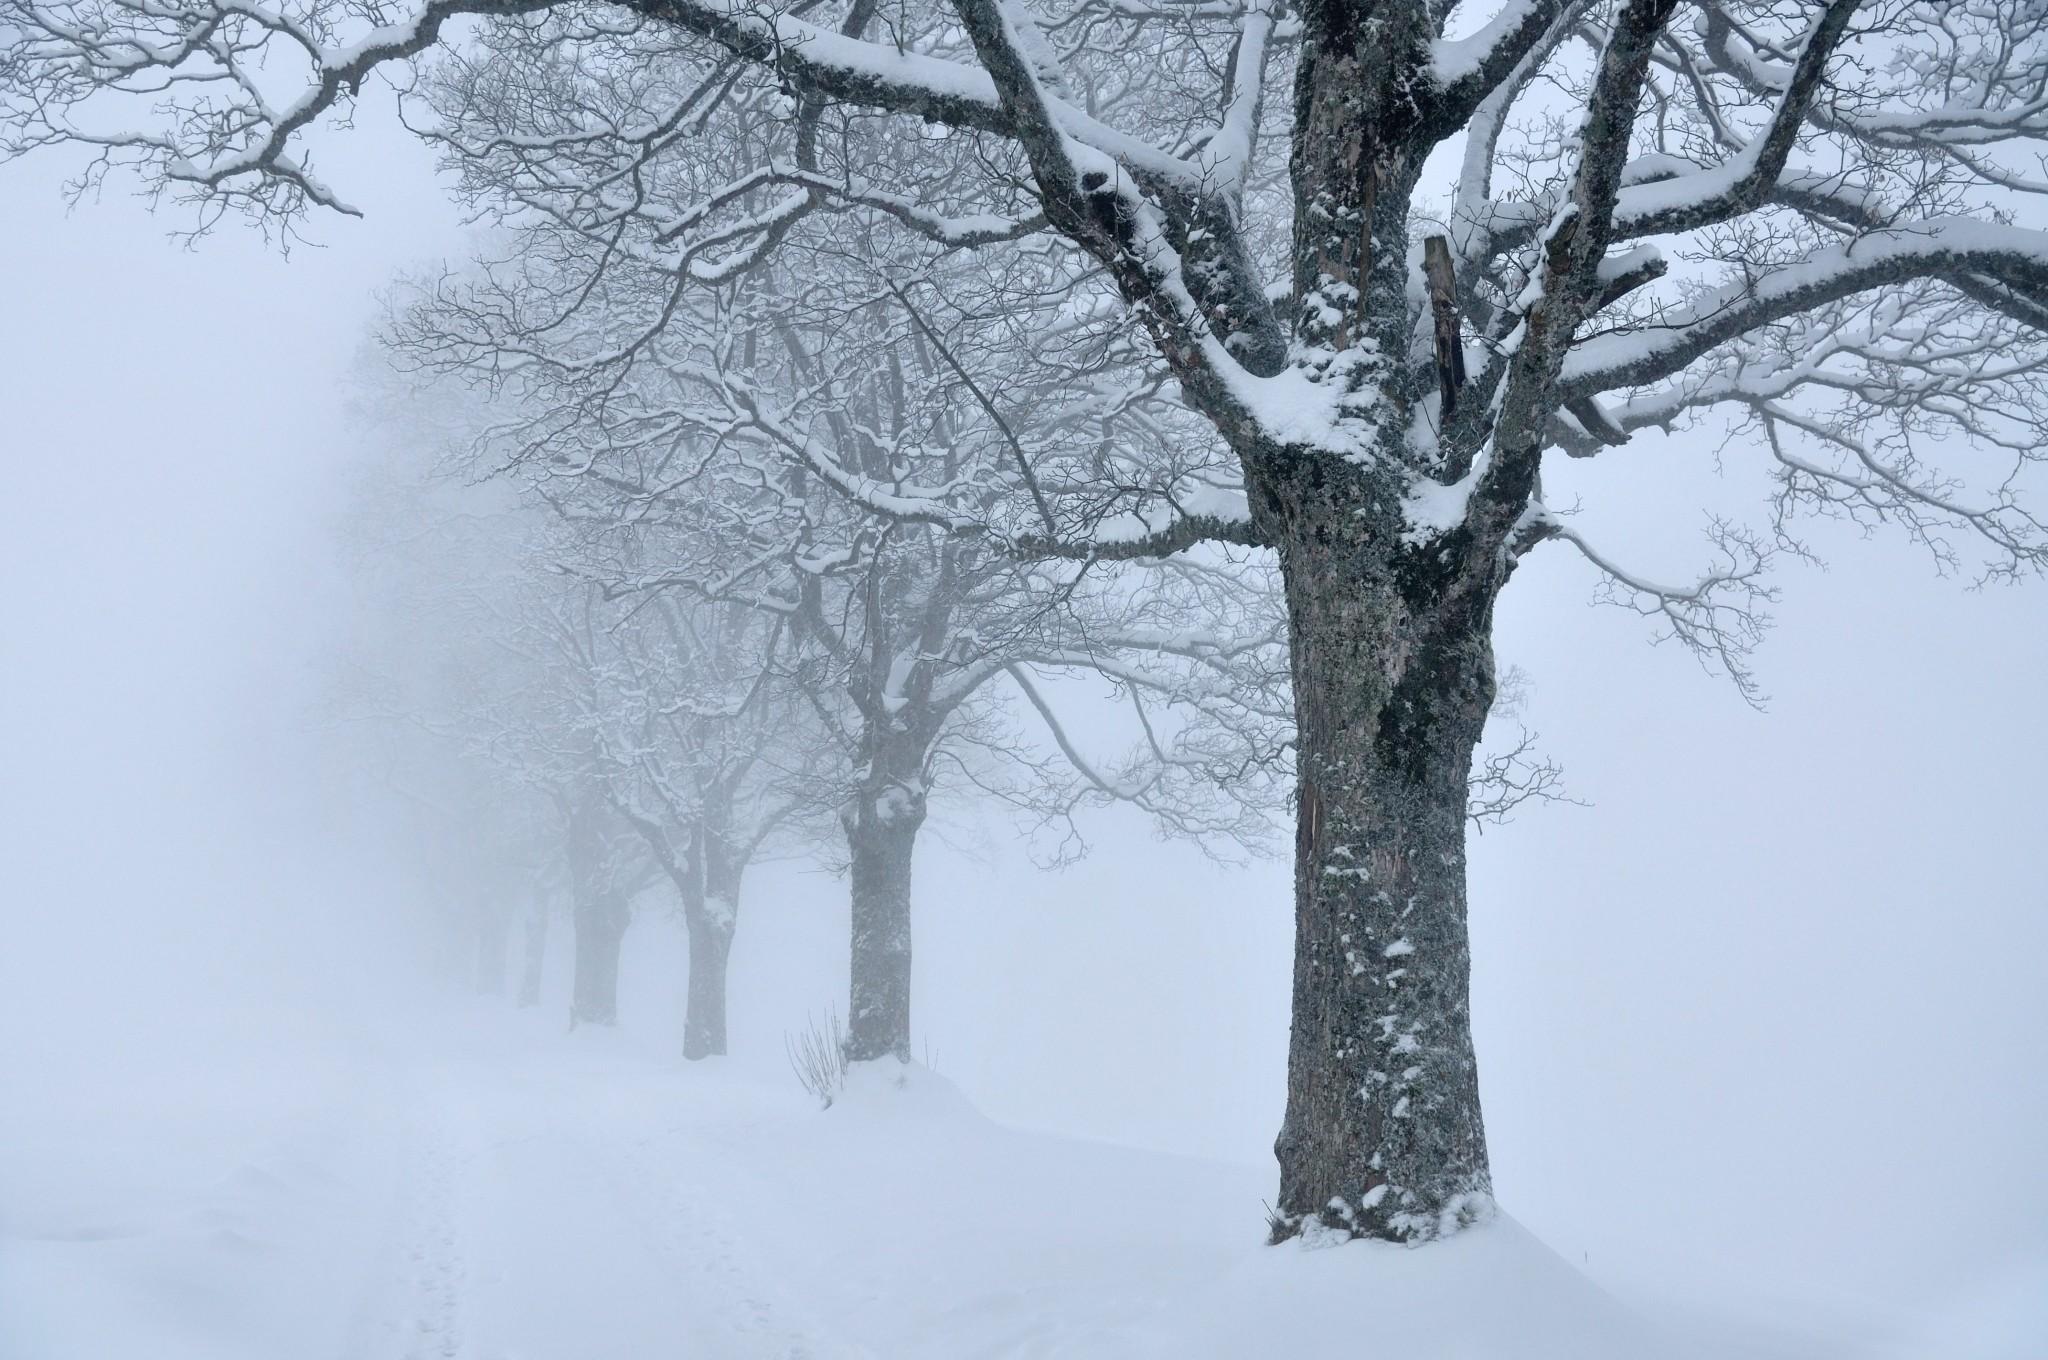 snow wallpaper desktop backgrounds free